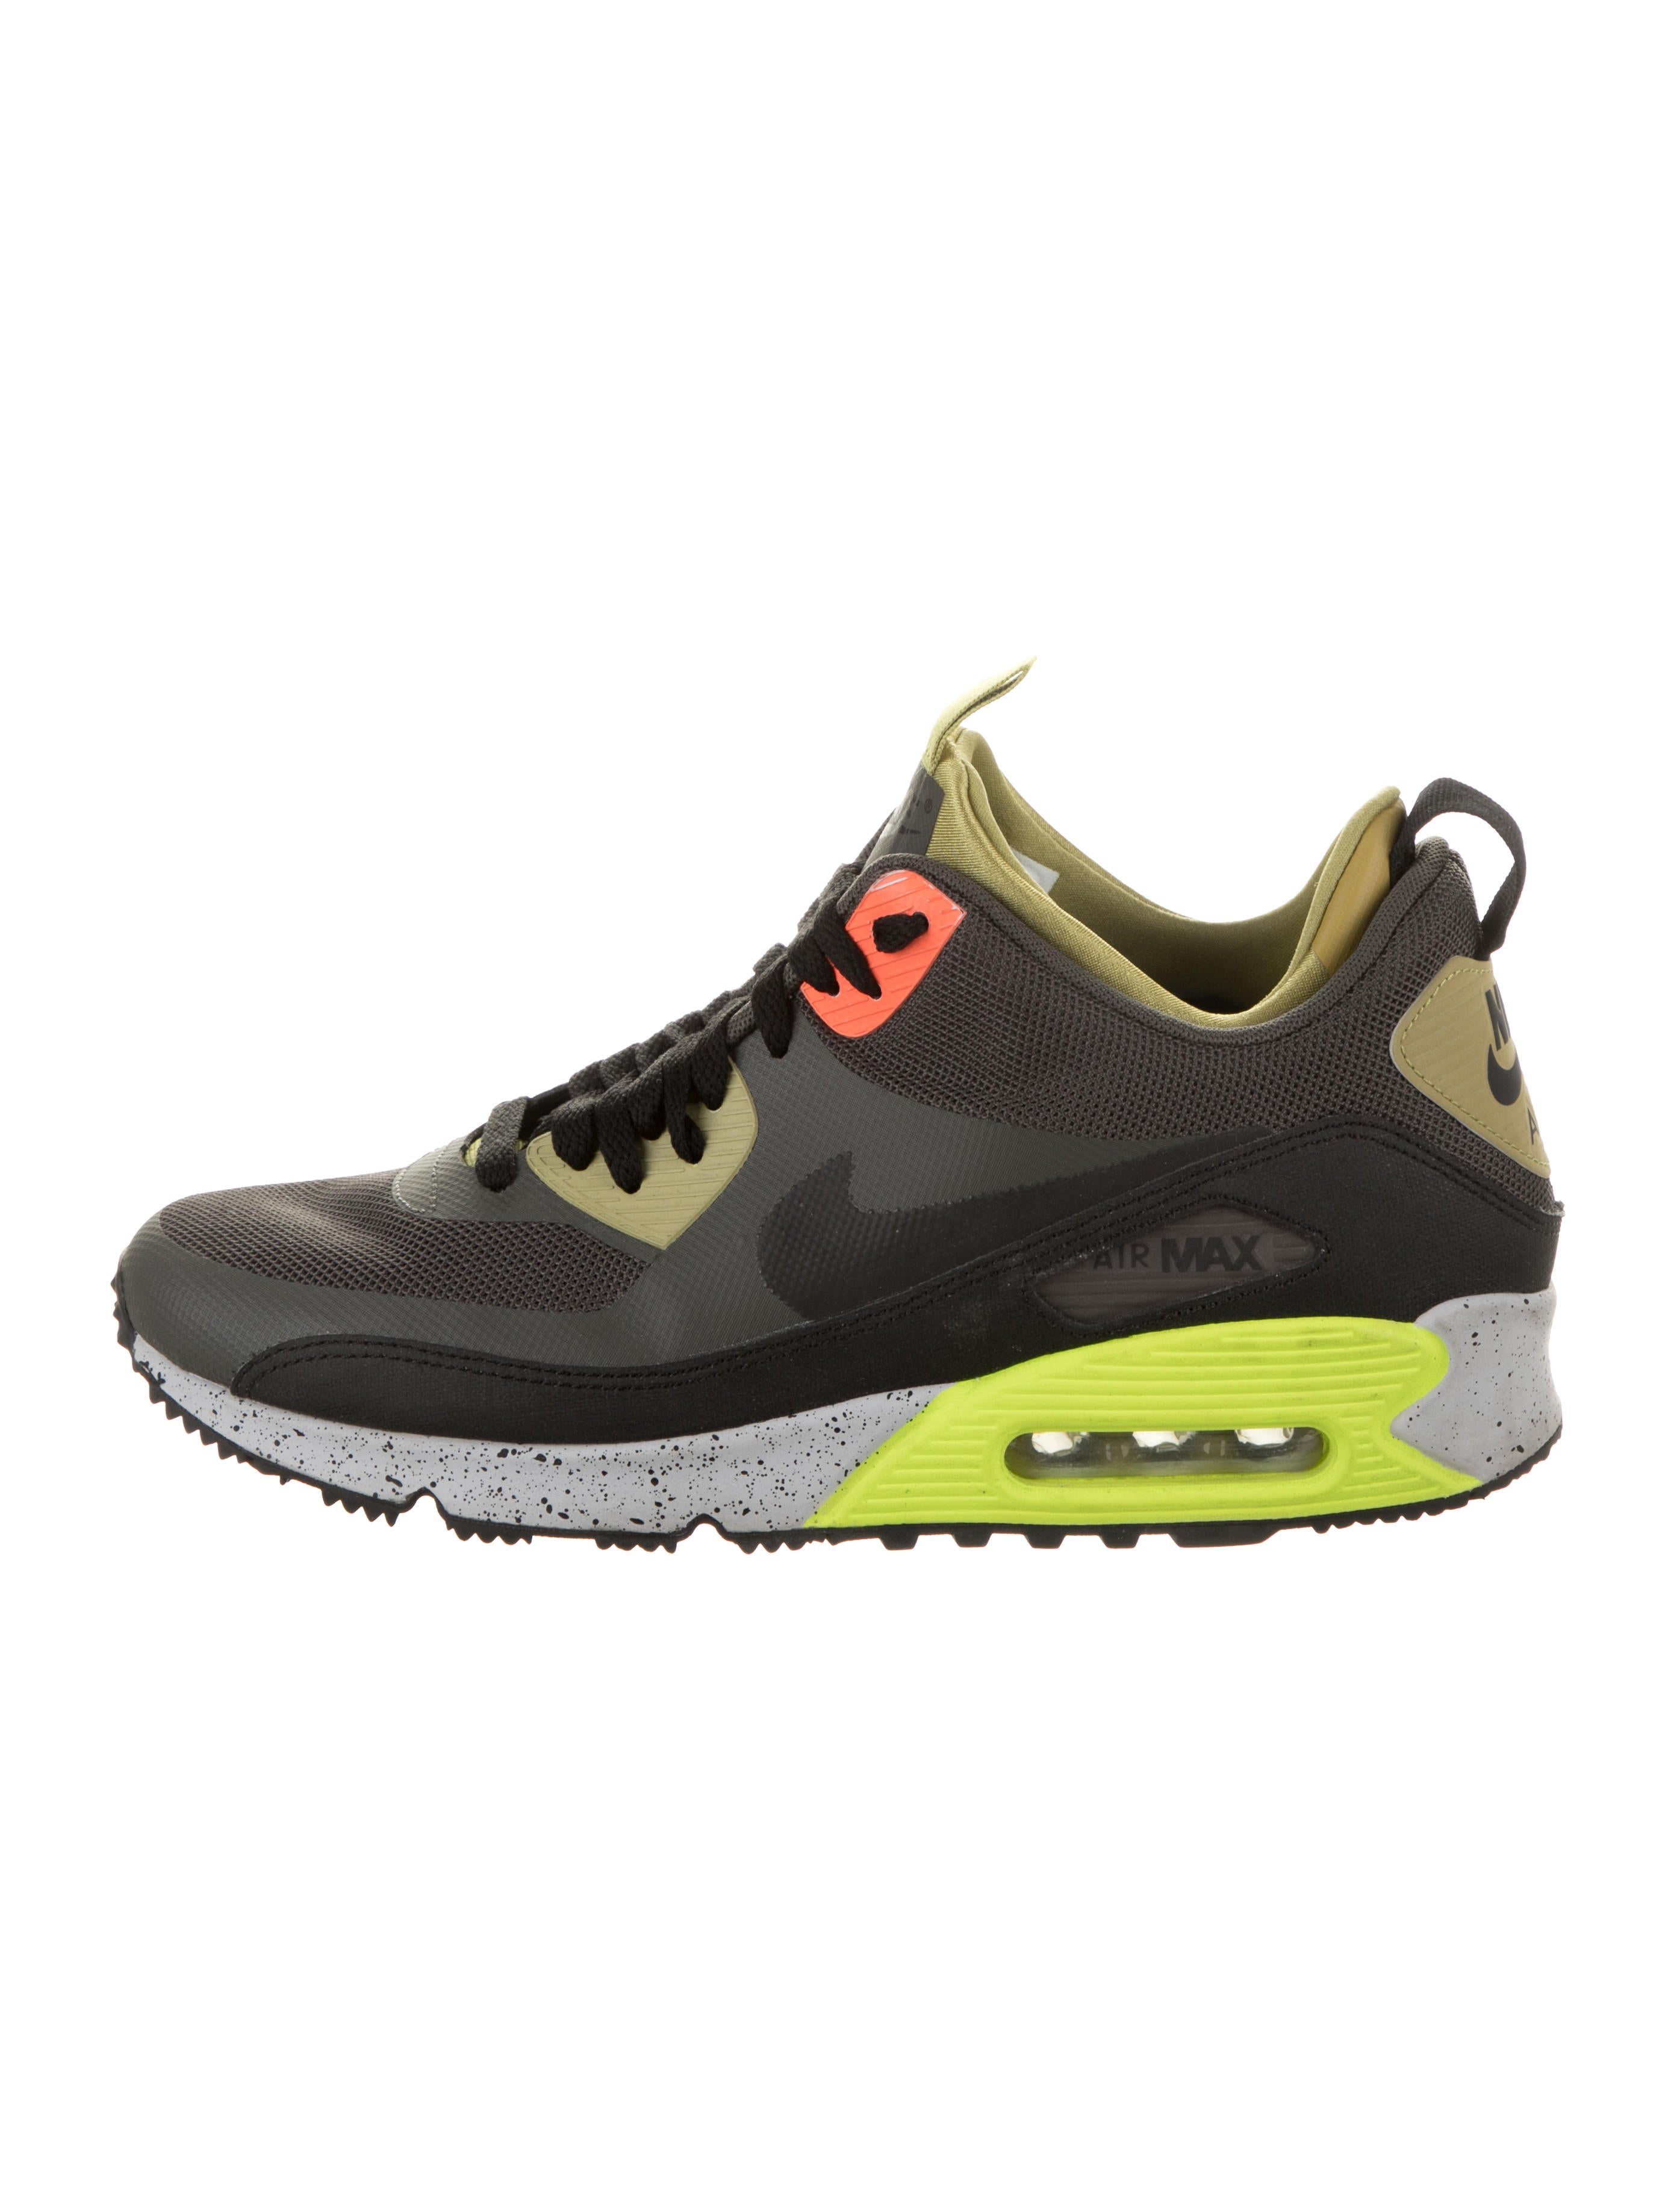 Nike Air Max 90 Sneakerboot NS Newsprint Sneakers Shoes